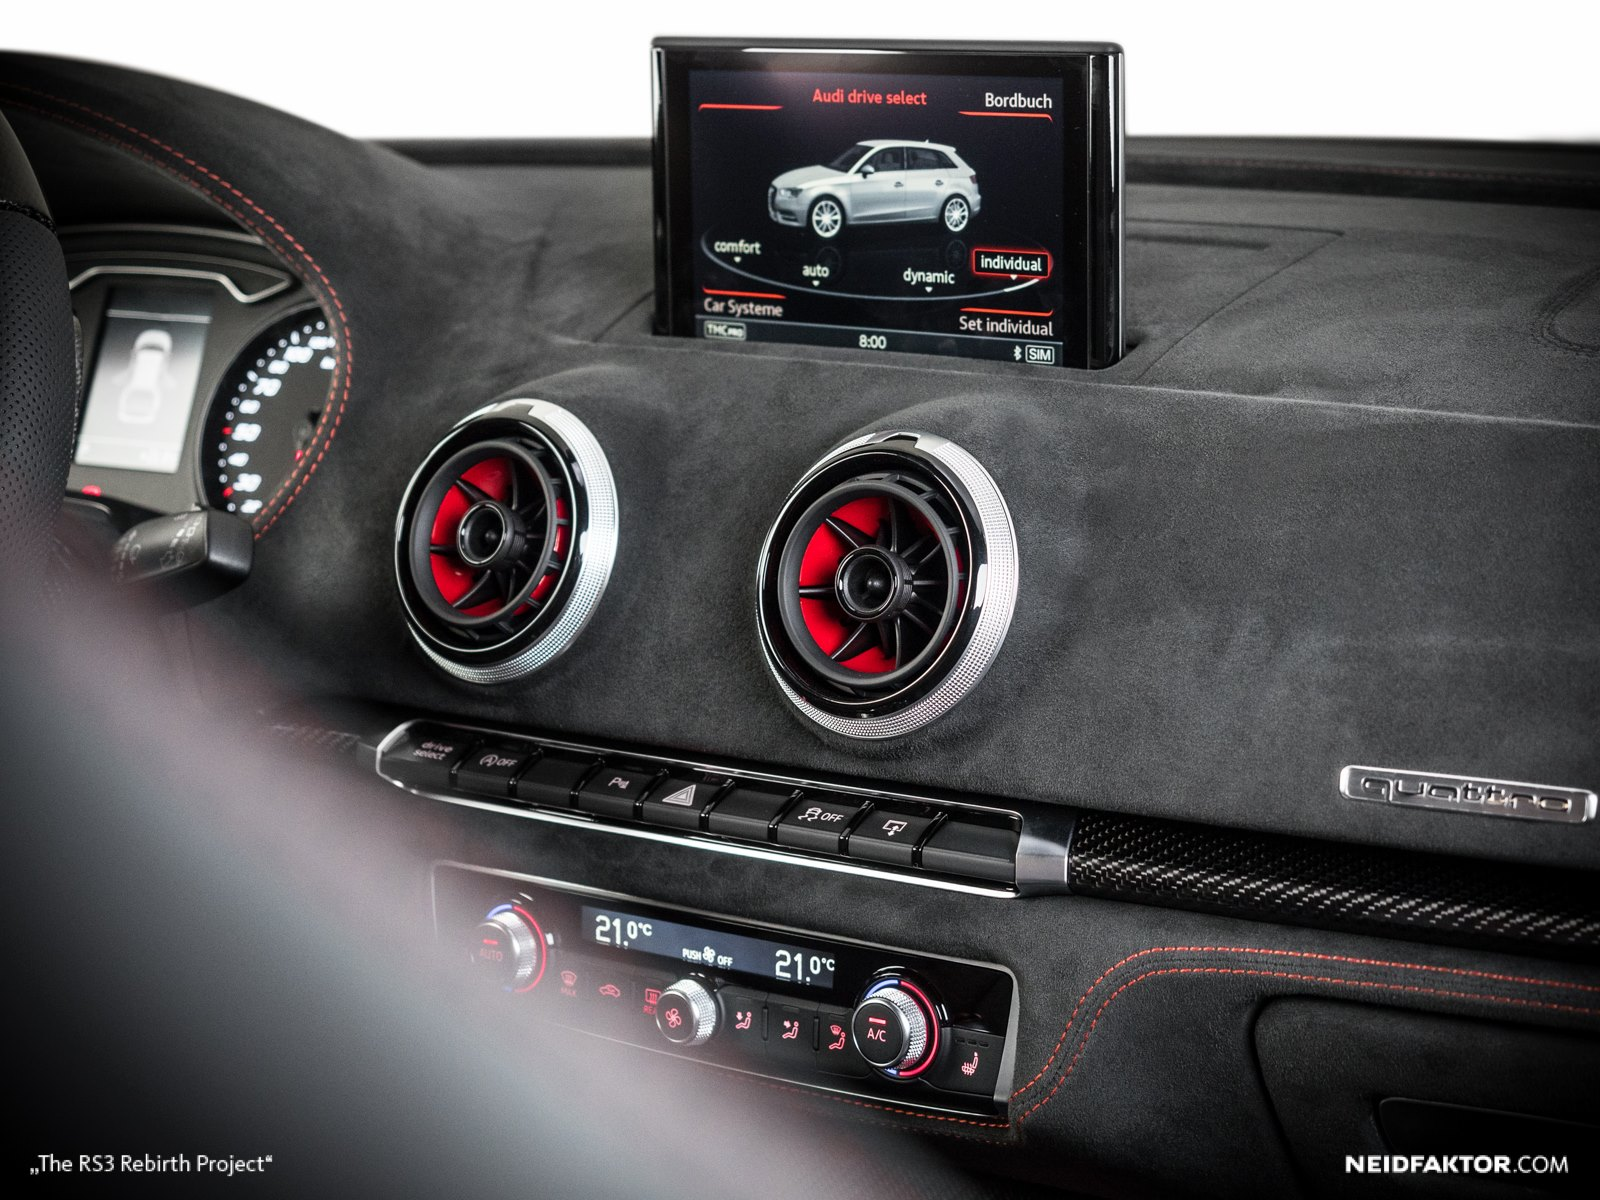 new audi rs3 gets carbon fiber and alcantara interior from neidfaktor autoevolution. Black Bedroom Furniture Sets. Home Design Ideas